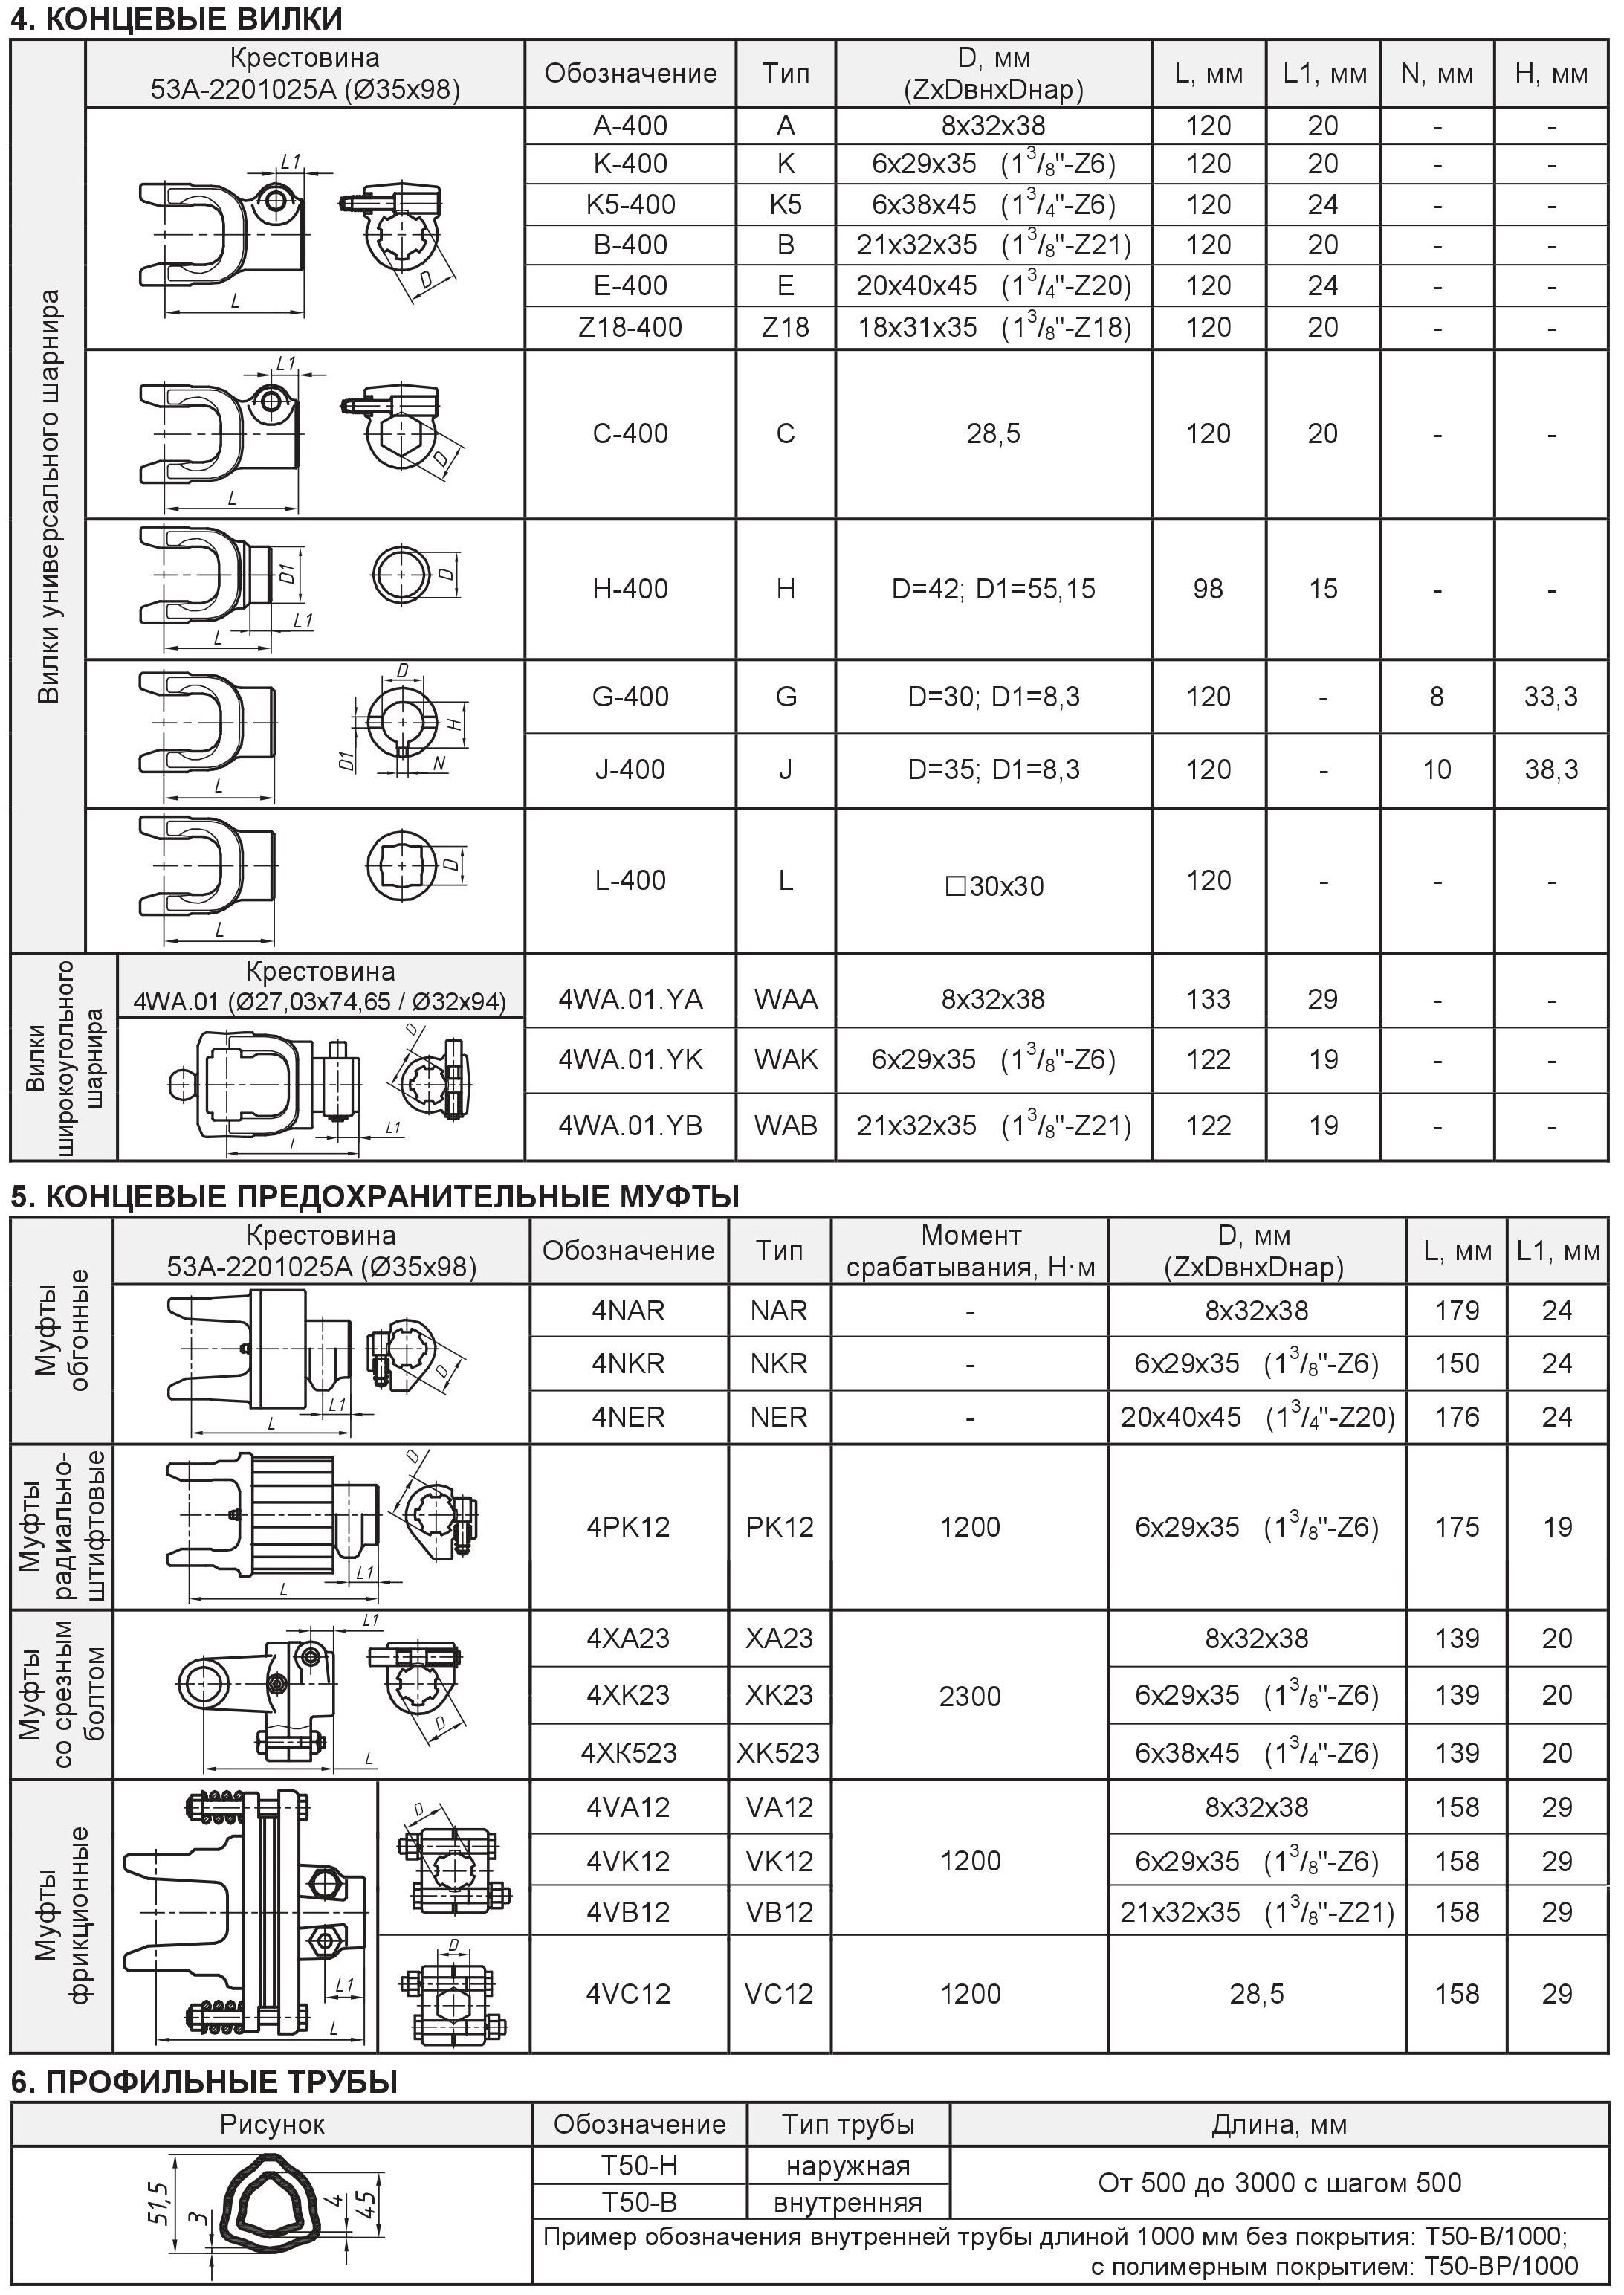 Концевые элементы карданных валов (карданов) типа Т4